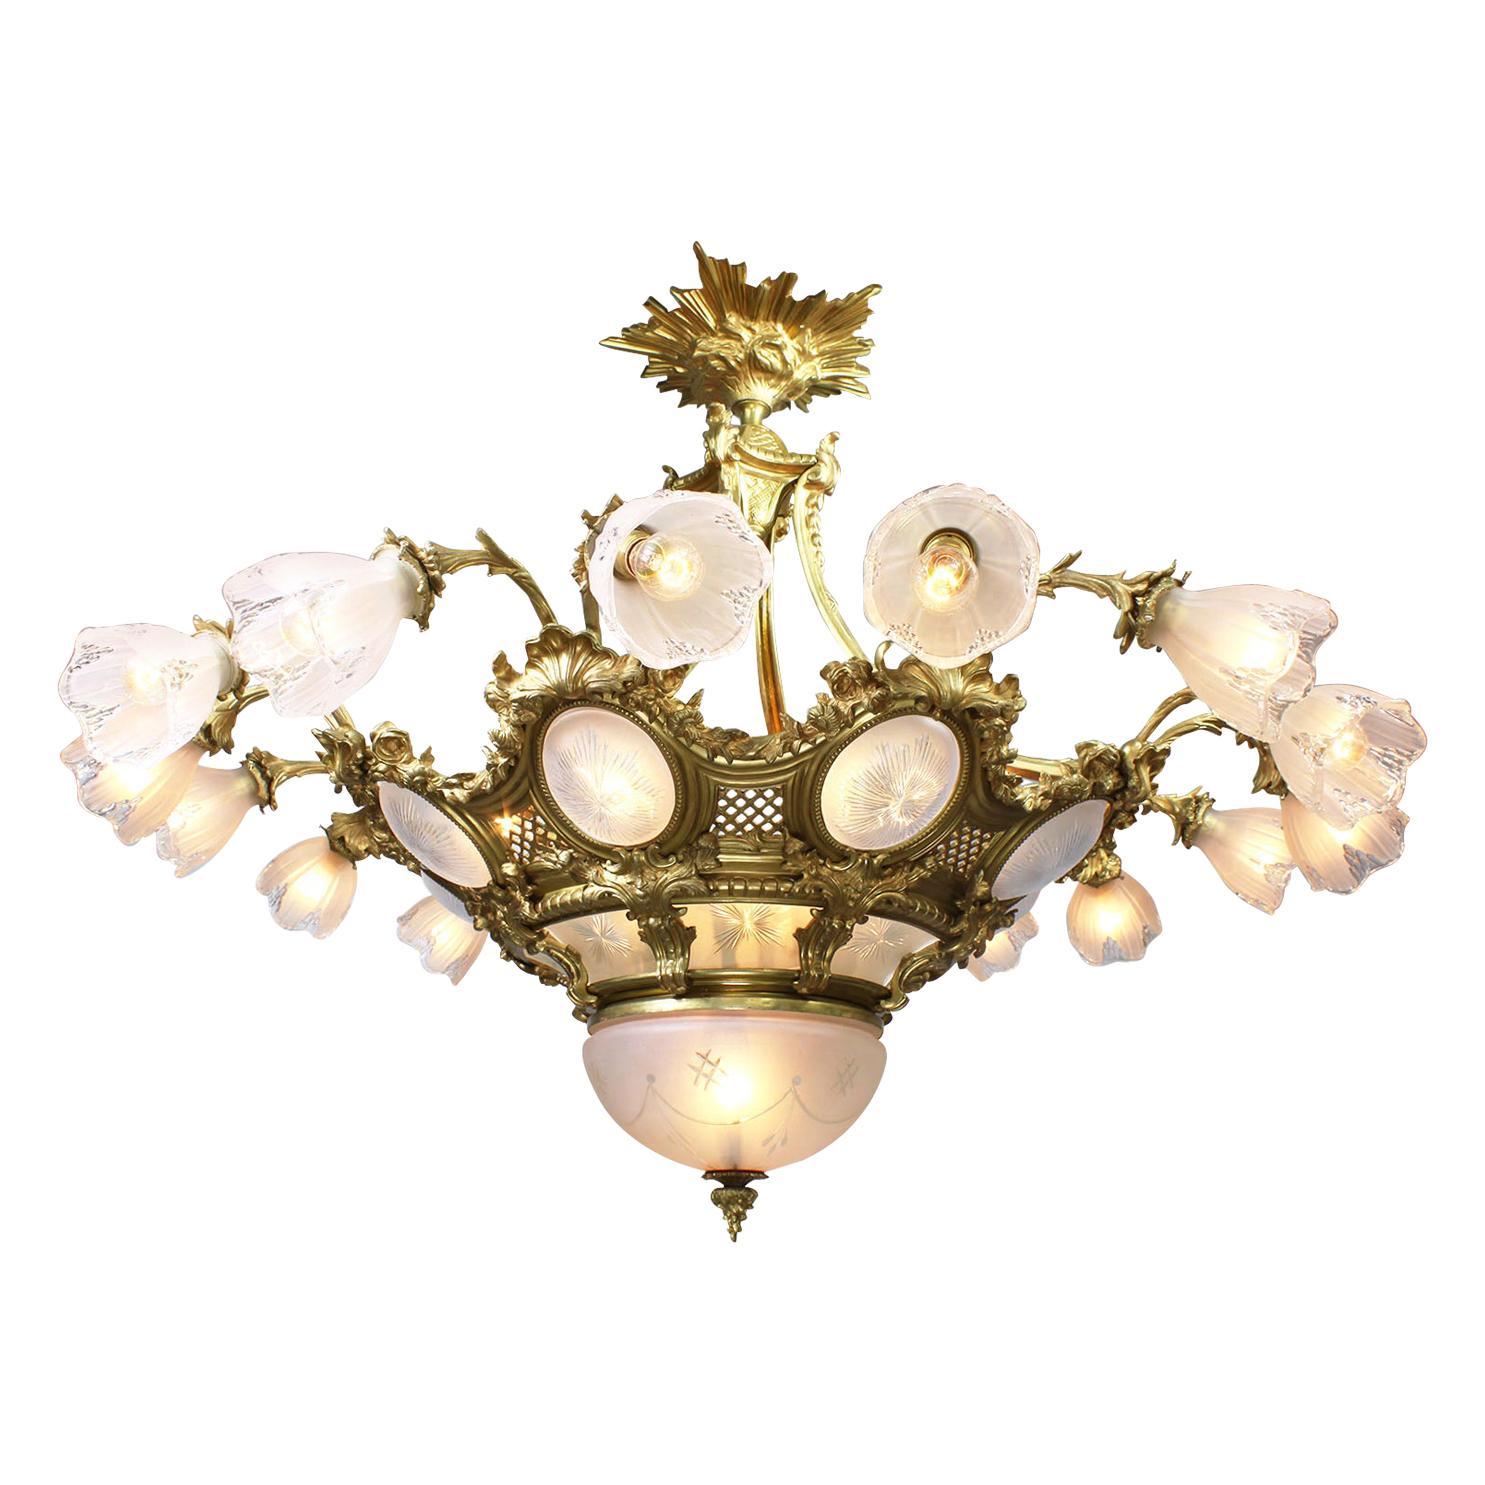 French Belle Époque Gilt-Bronze & Molded Glass 16 Light Plafonnier Chandelier